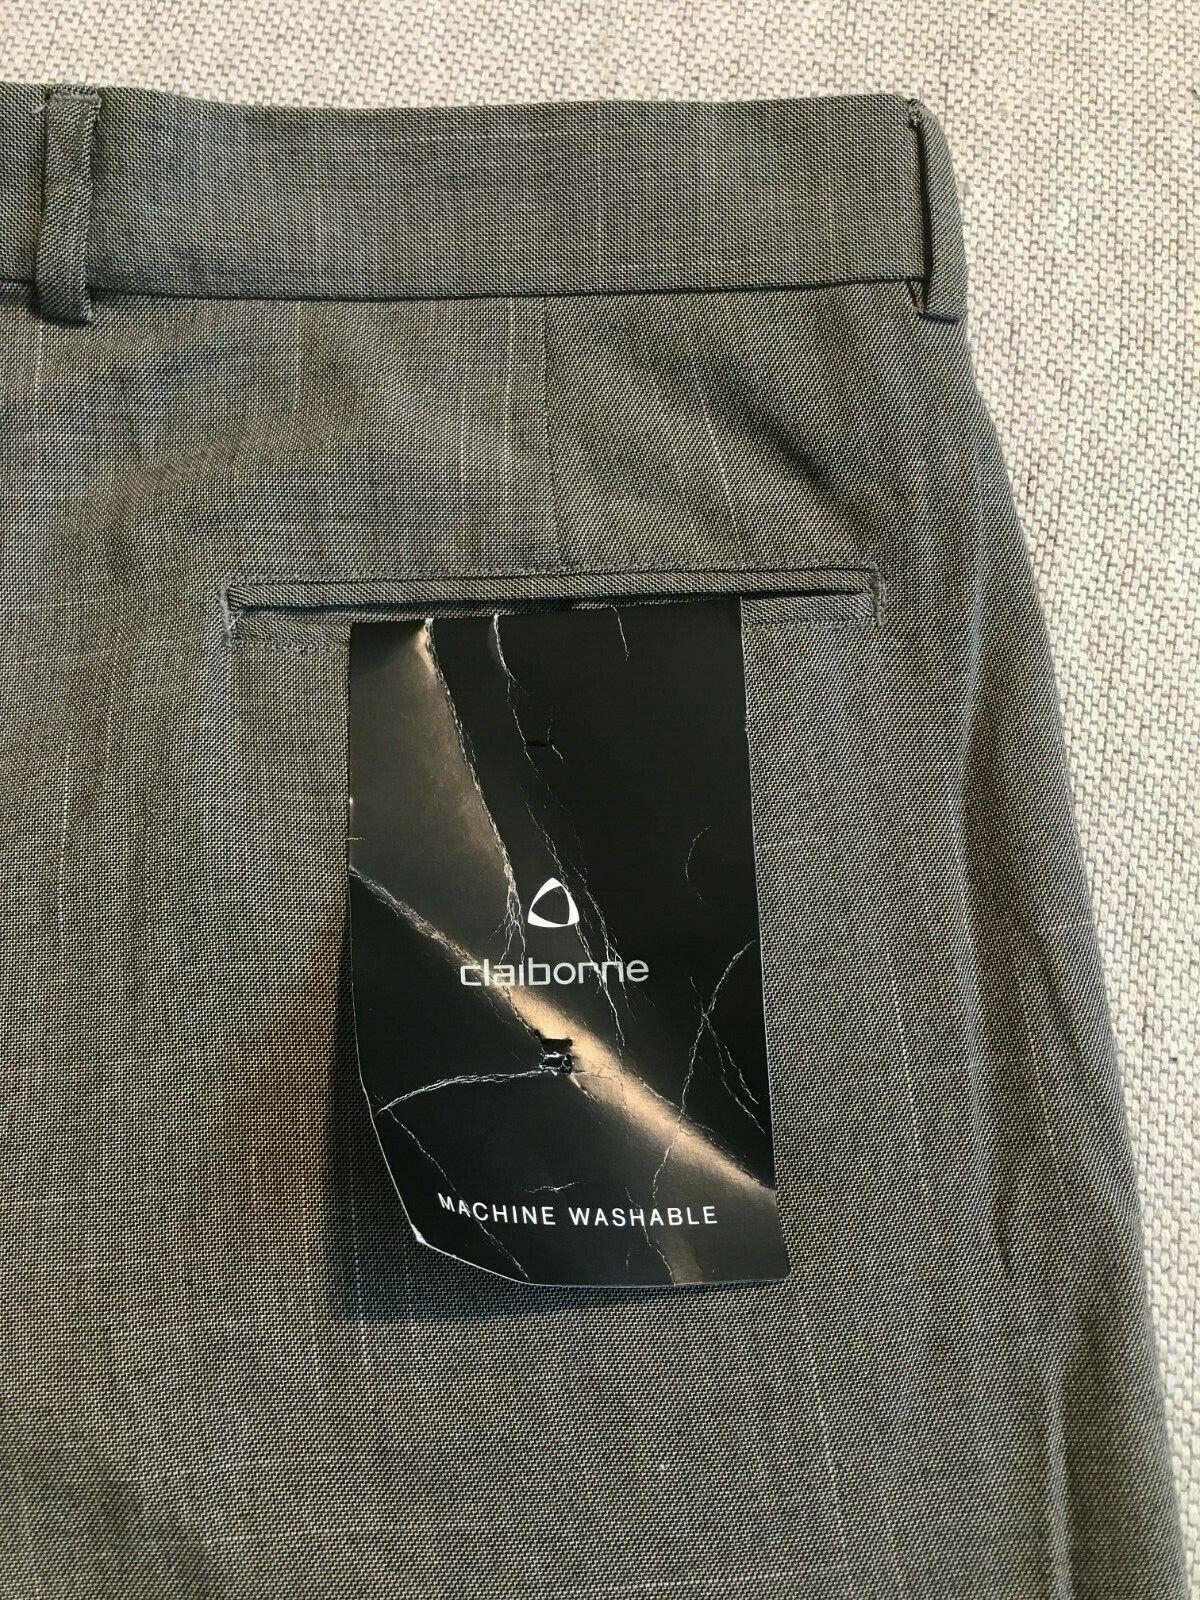 Caliborne Men's Pleated Front Dress Pants Folded Hem Sz 36x32  B2